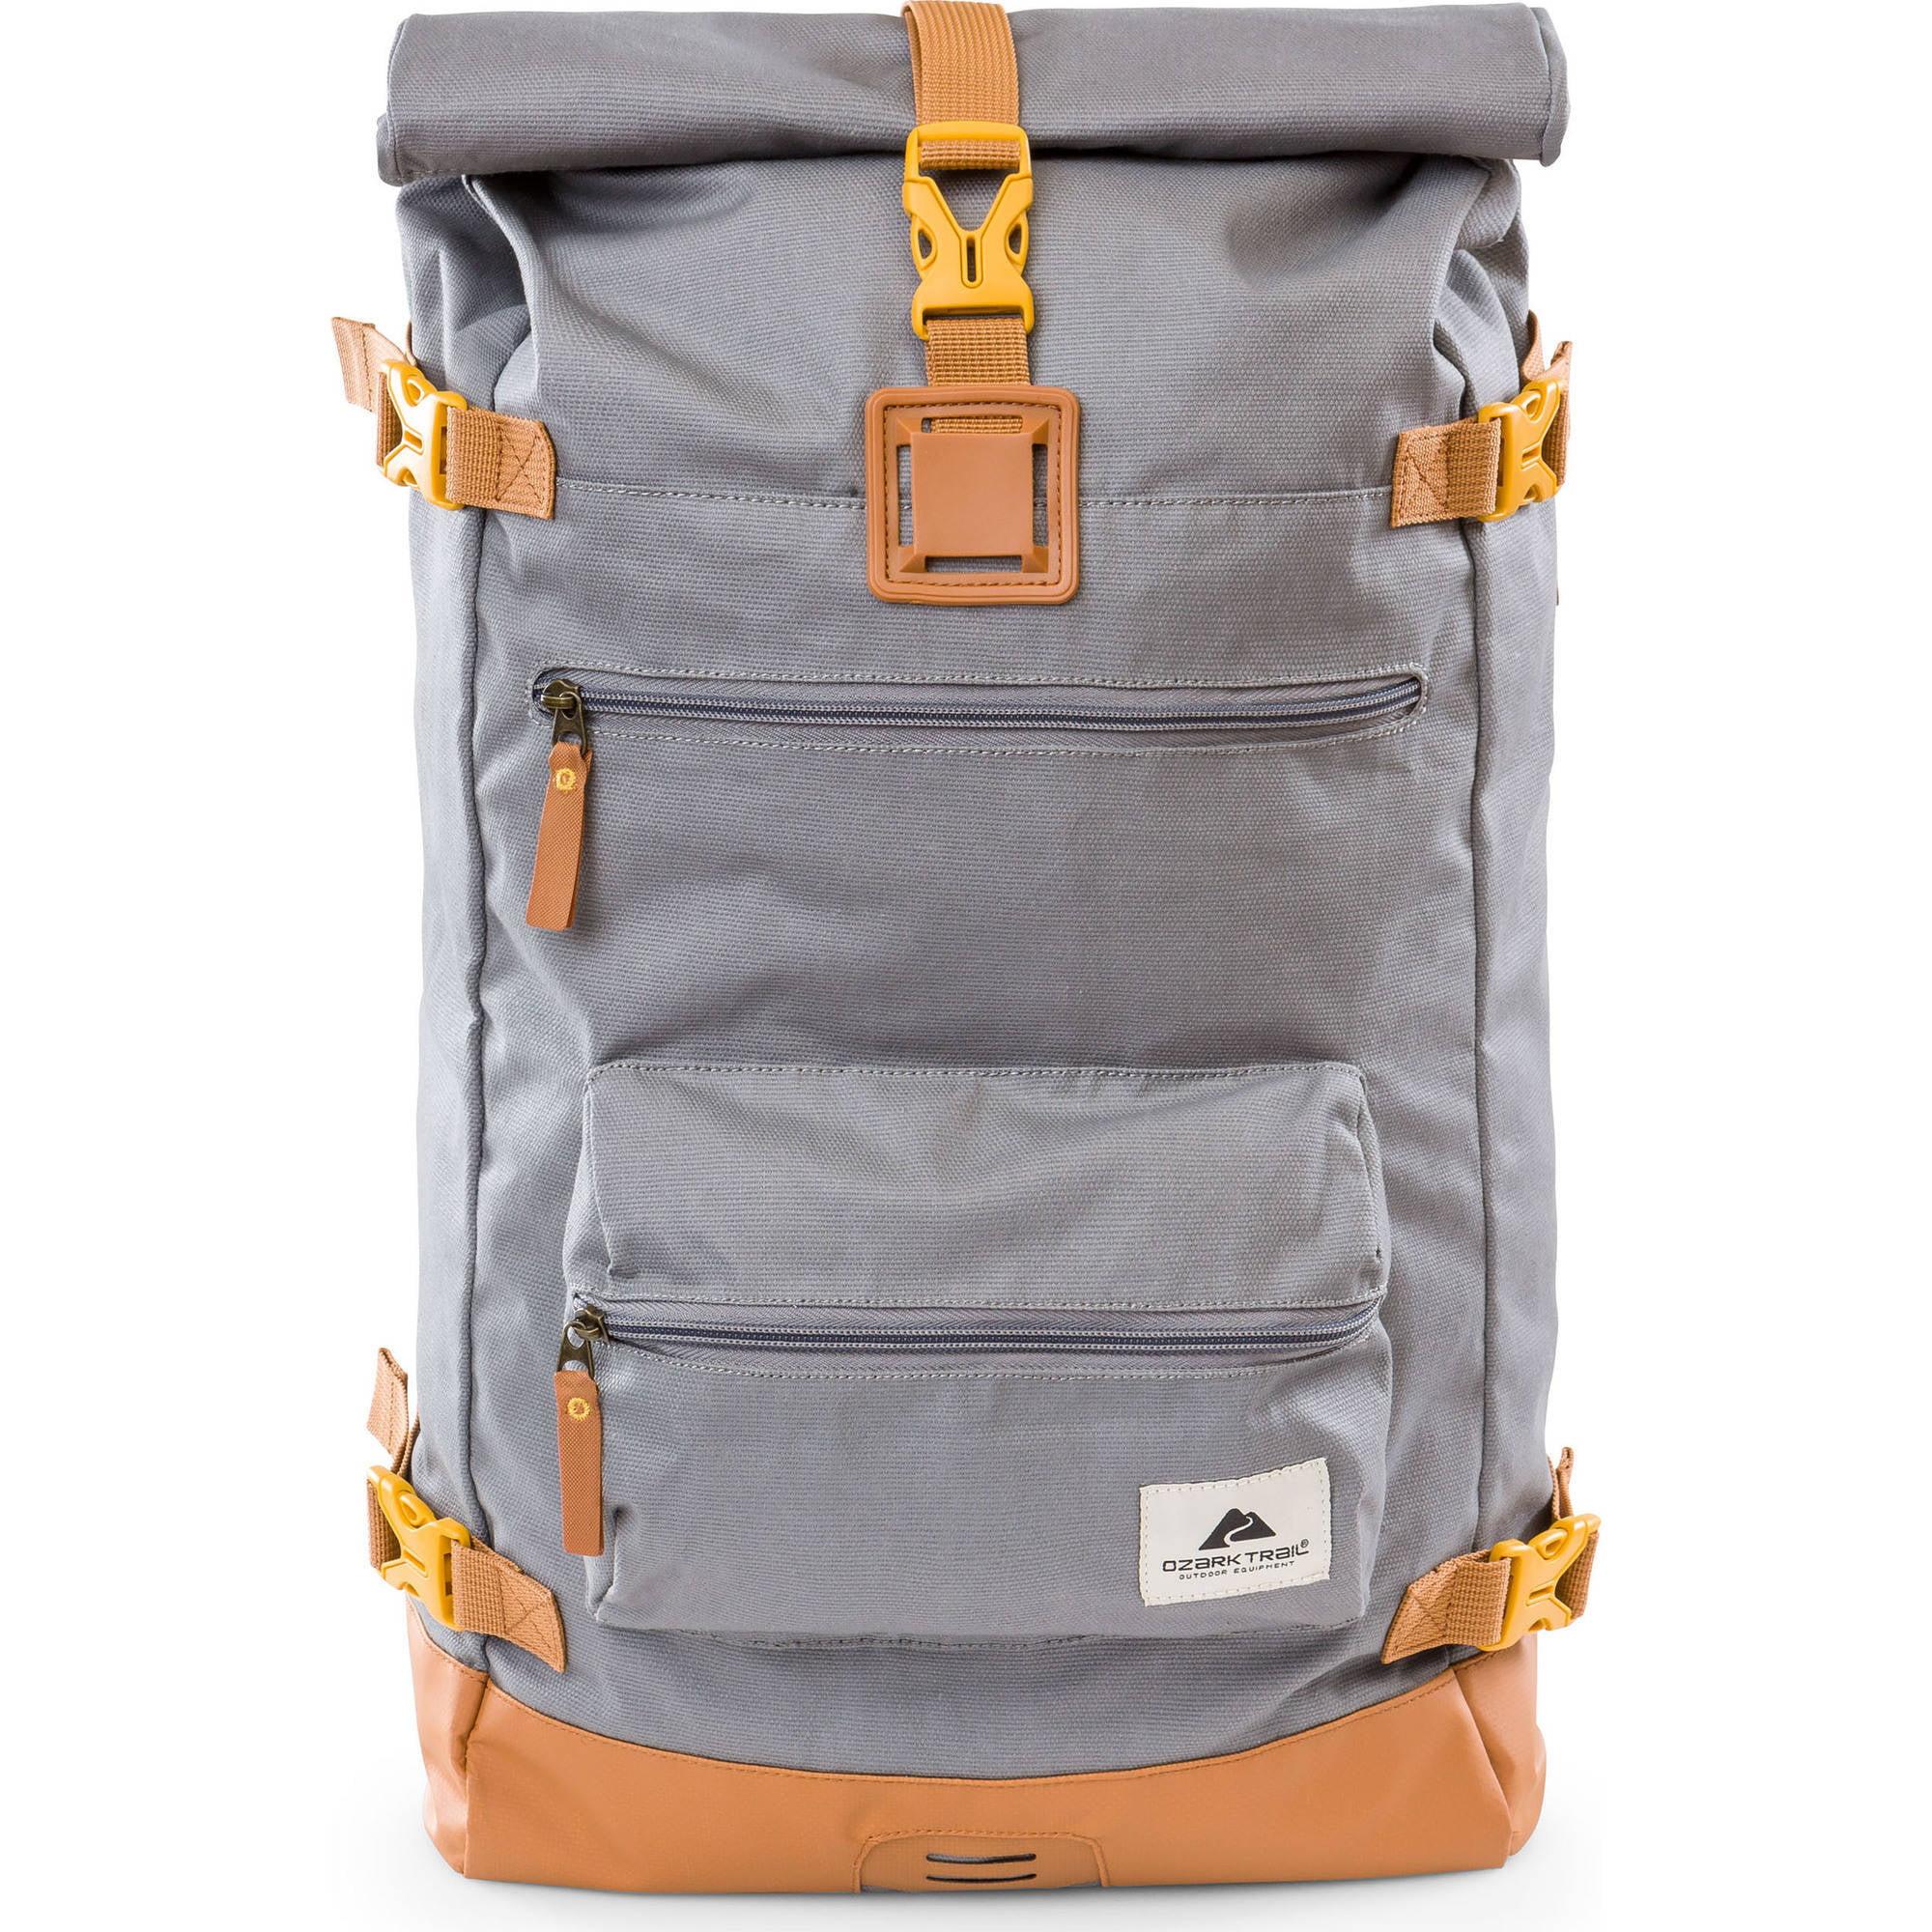 Ozark Trail 25L Roll Top Backpack